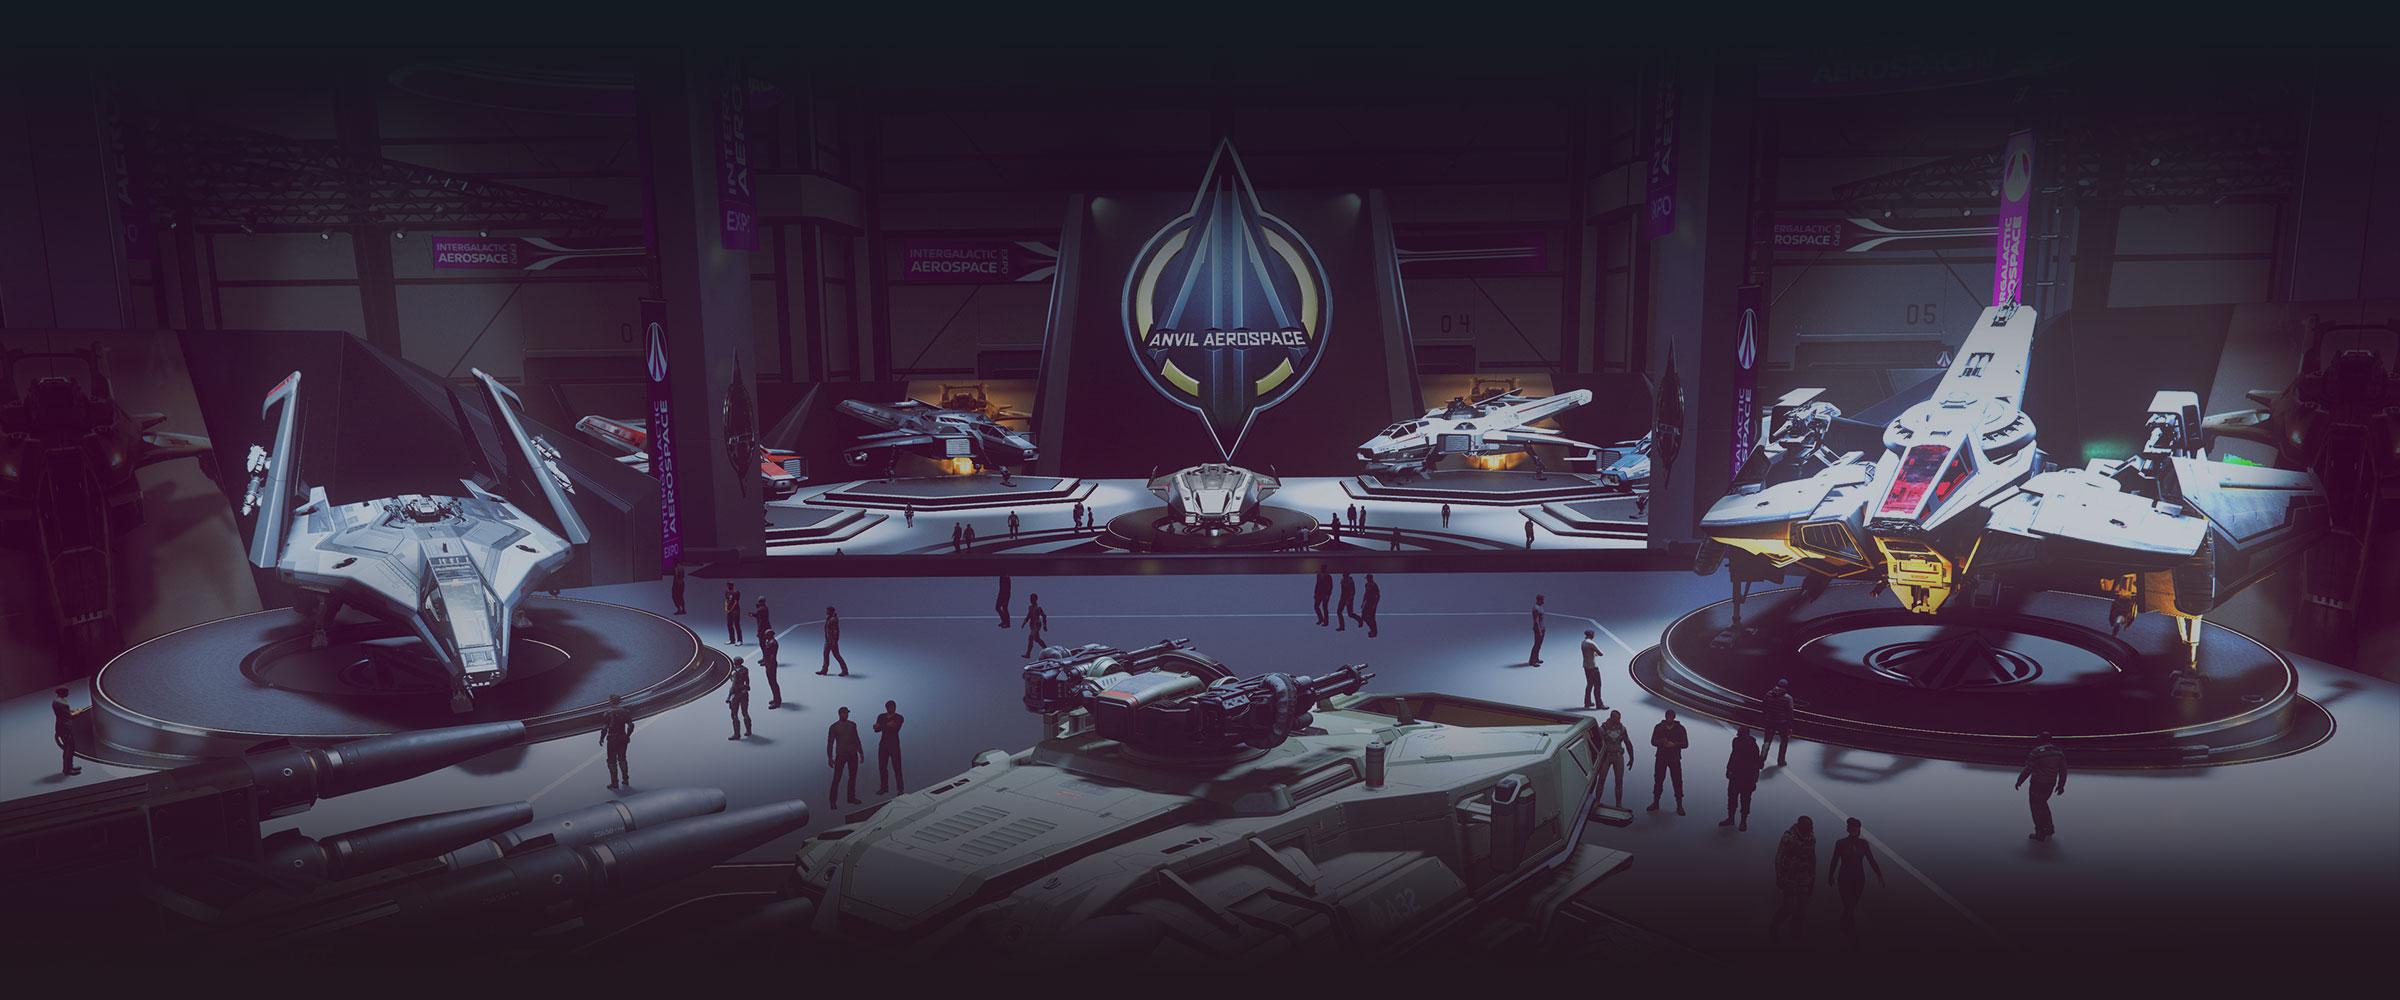 Intergalactic Aerospace Expo 2949 title image